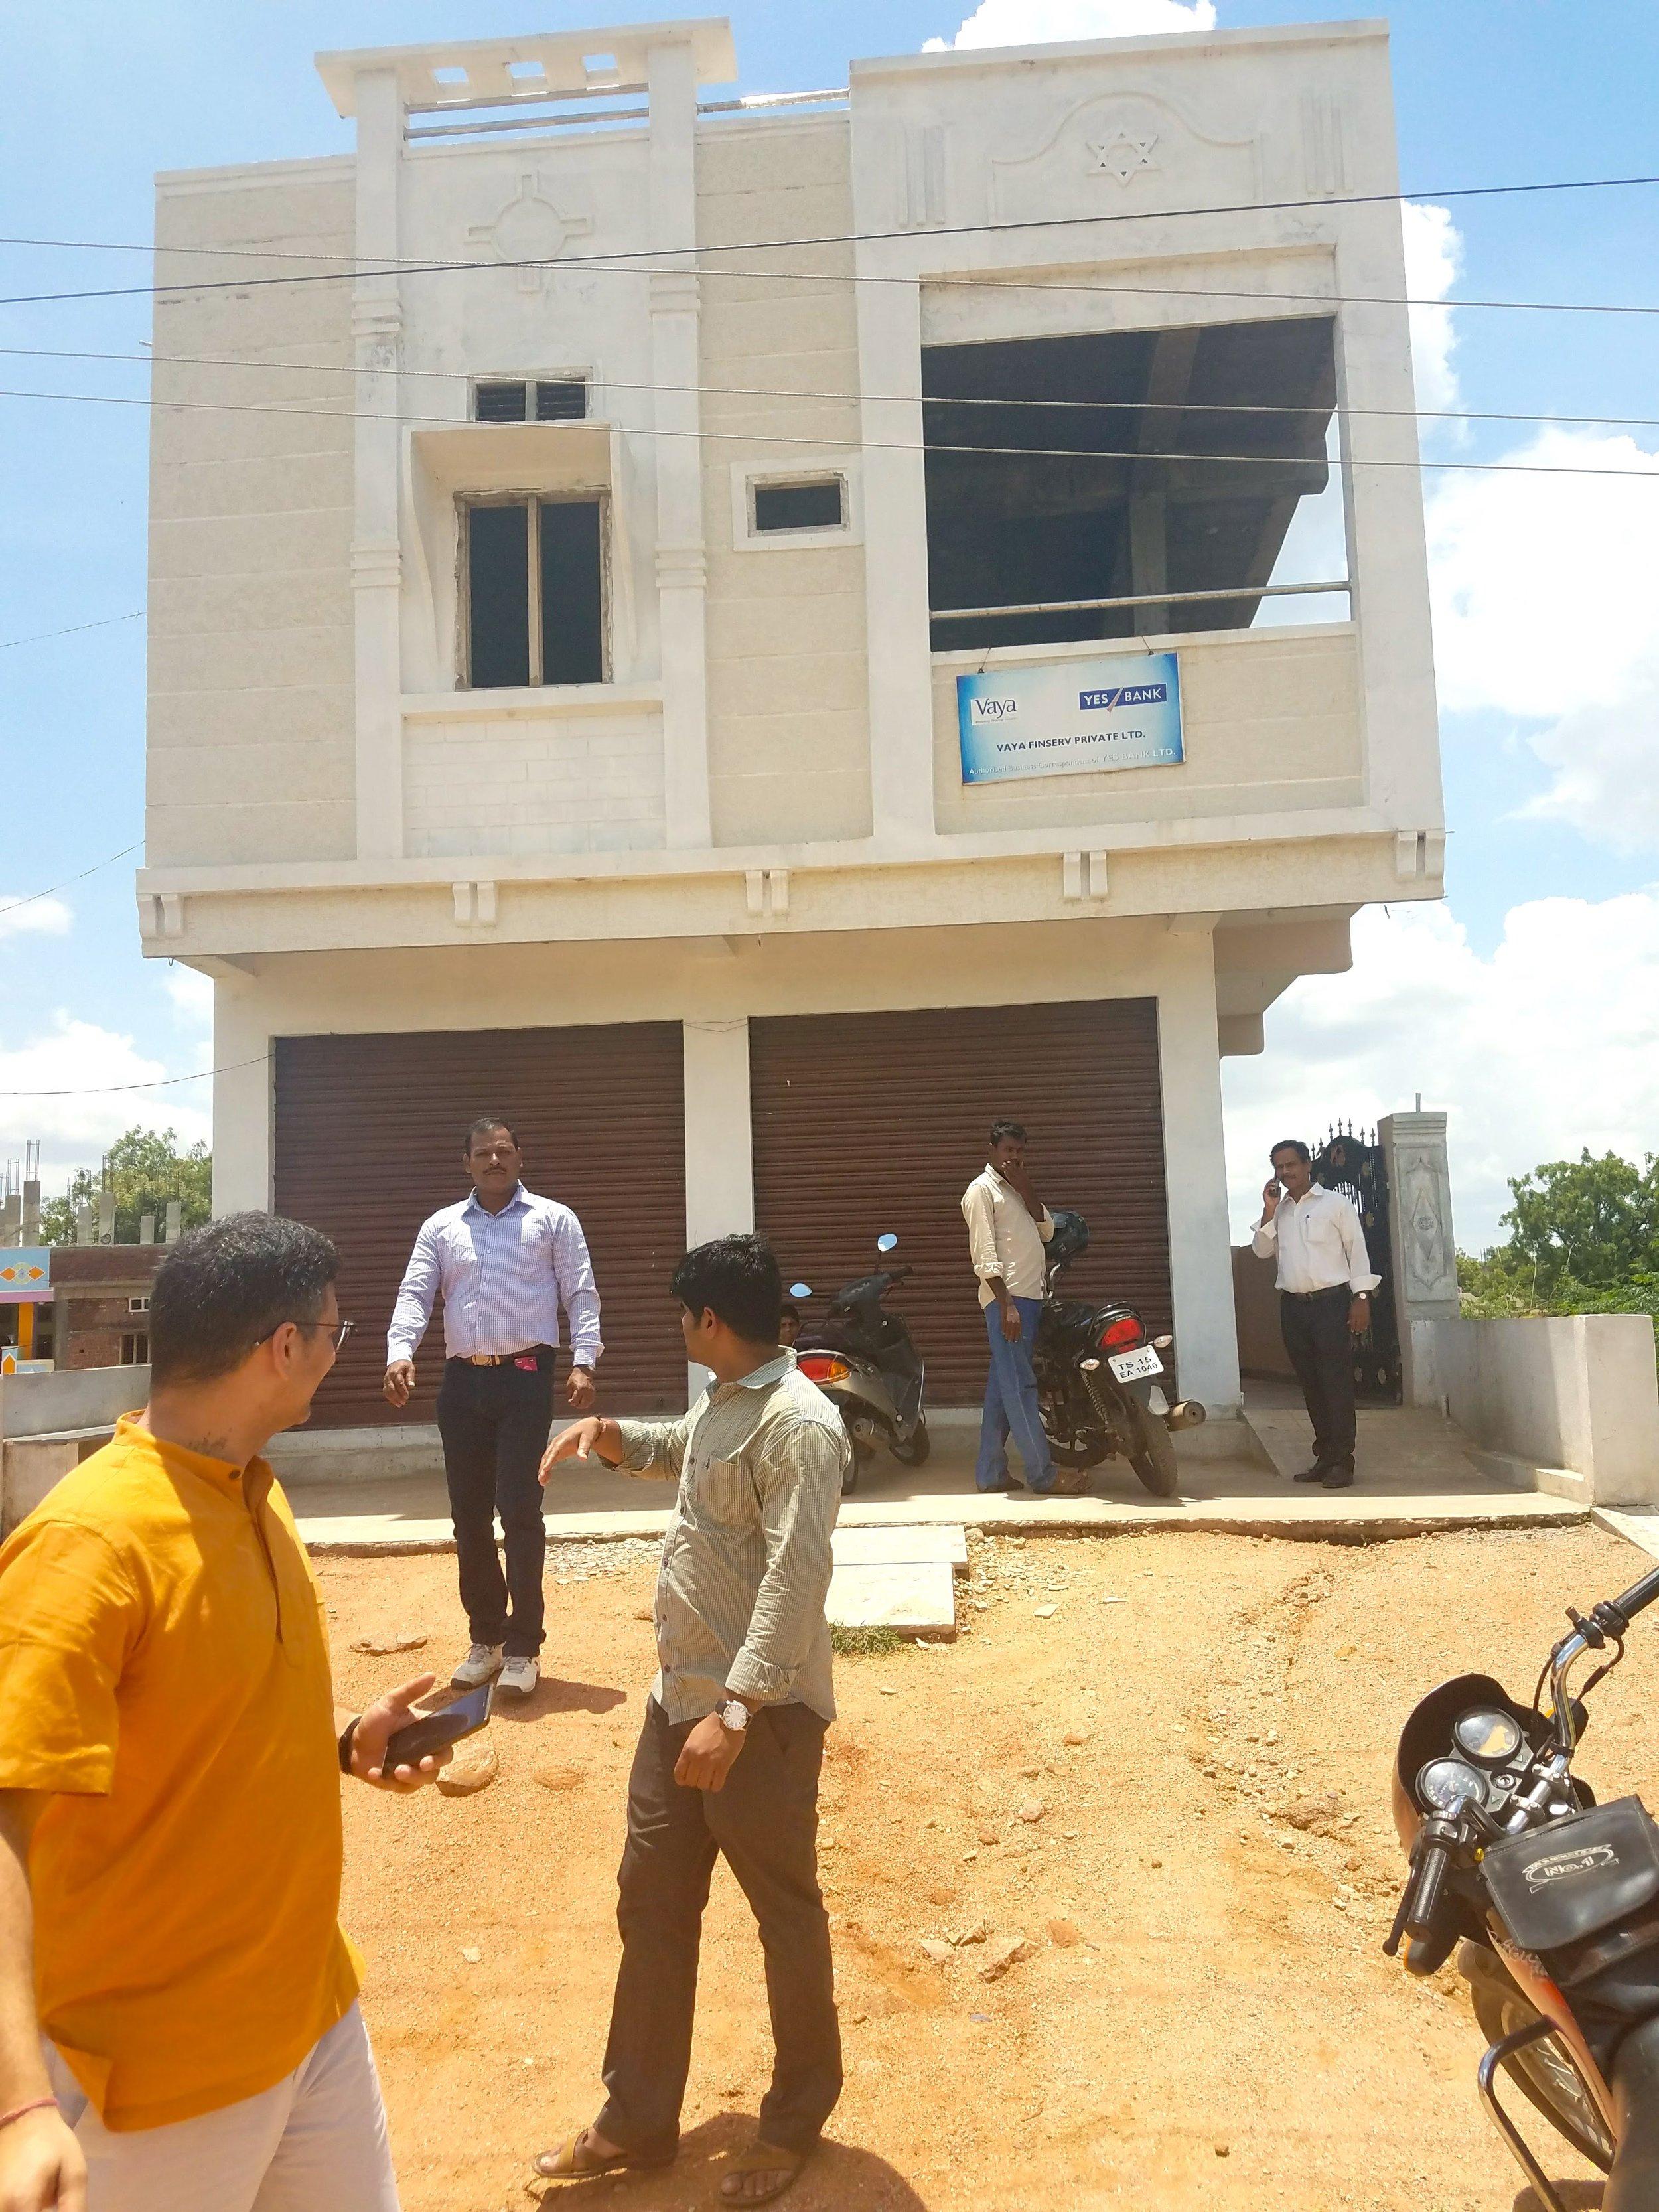 The local Vaya Branch Office in Narayankhed, Telangana./ June 21, 2017